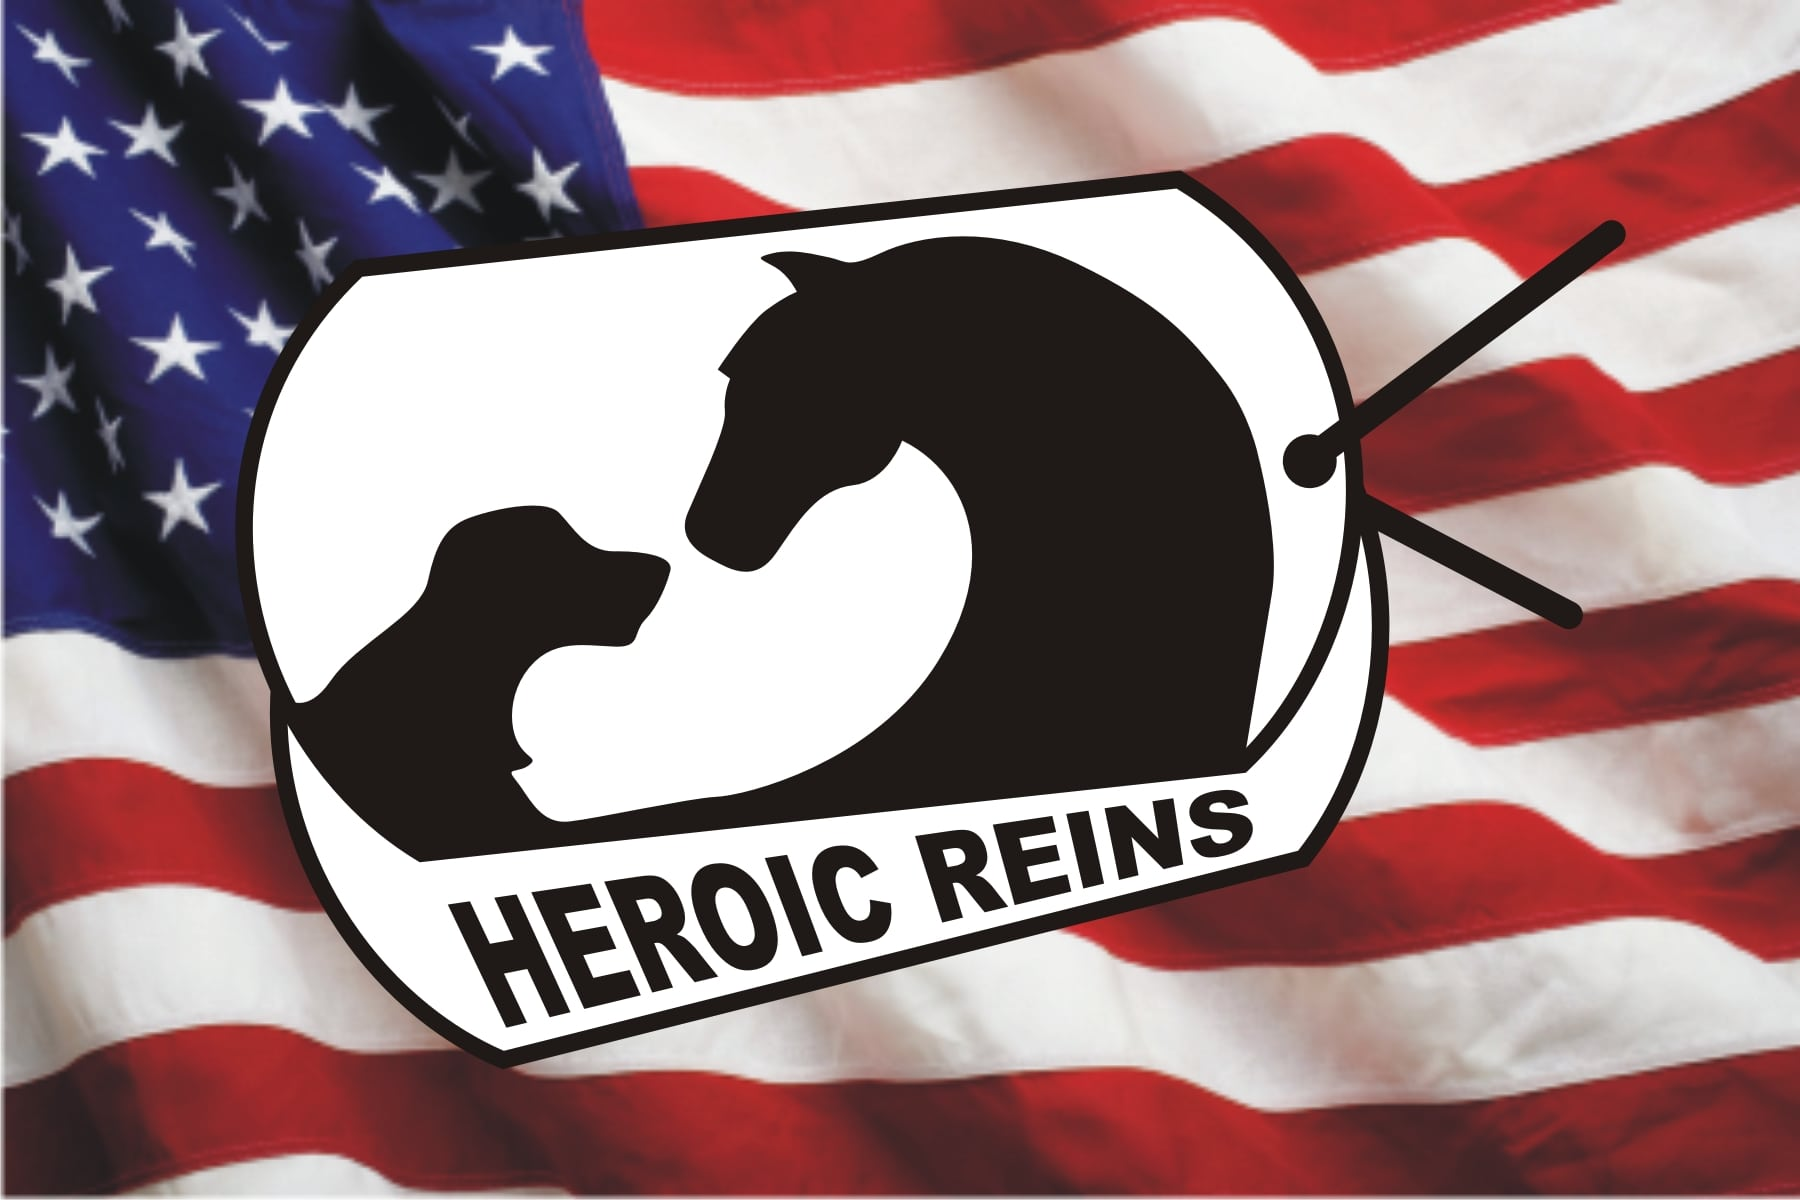 HeroicReins_logo